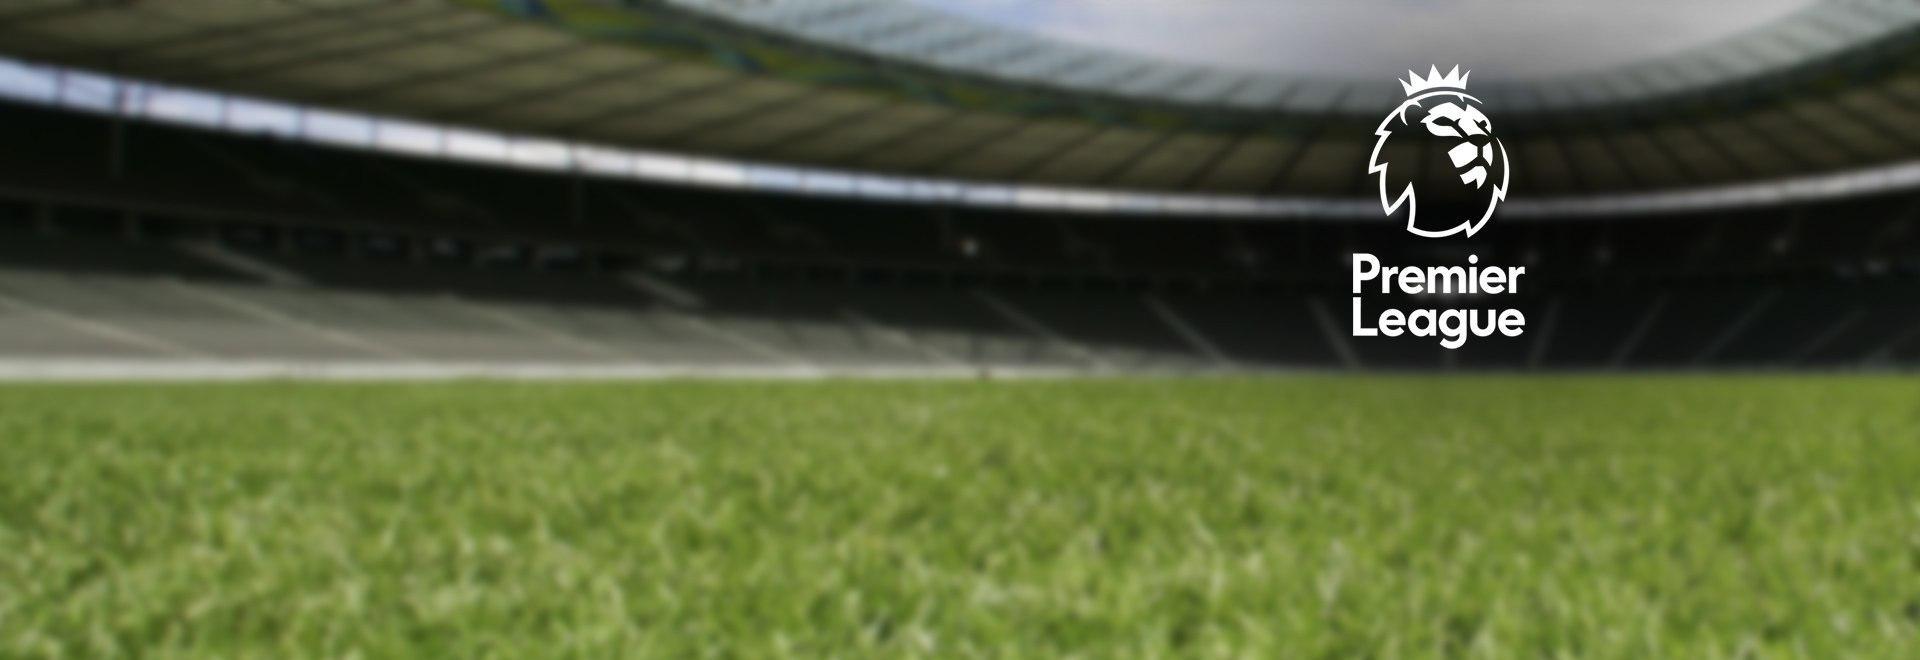 Chelsea - Aston Villa. 16a g.